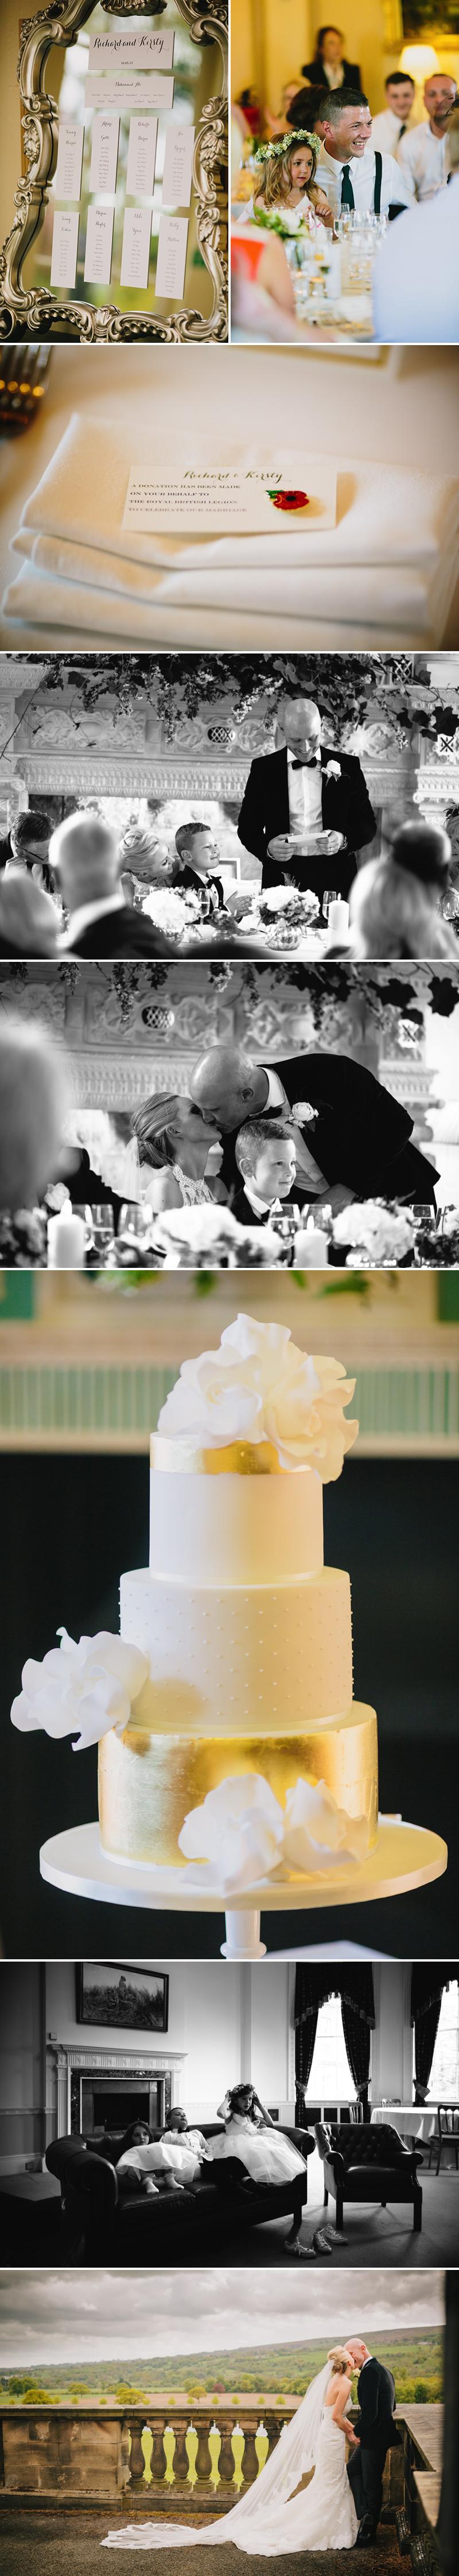 wedding-venues-in-yorkshire-denton-hall-wedding-photography-004